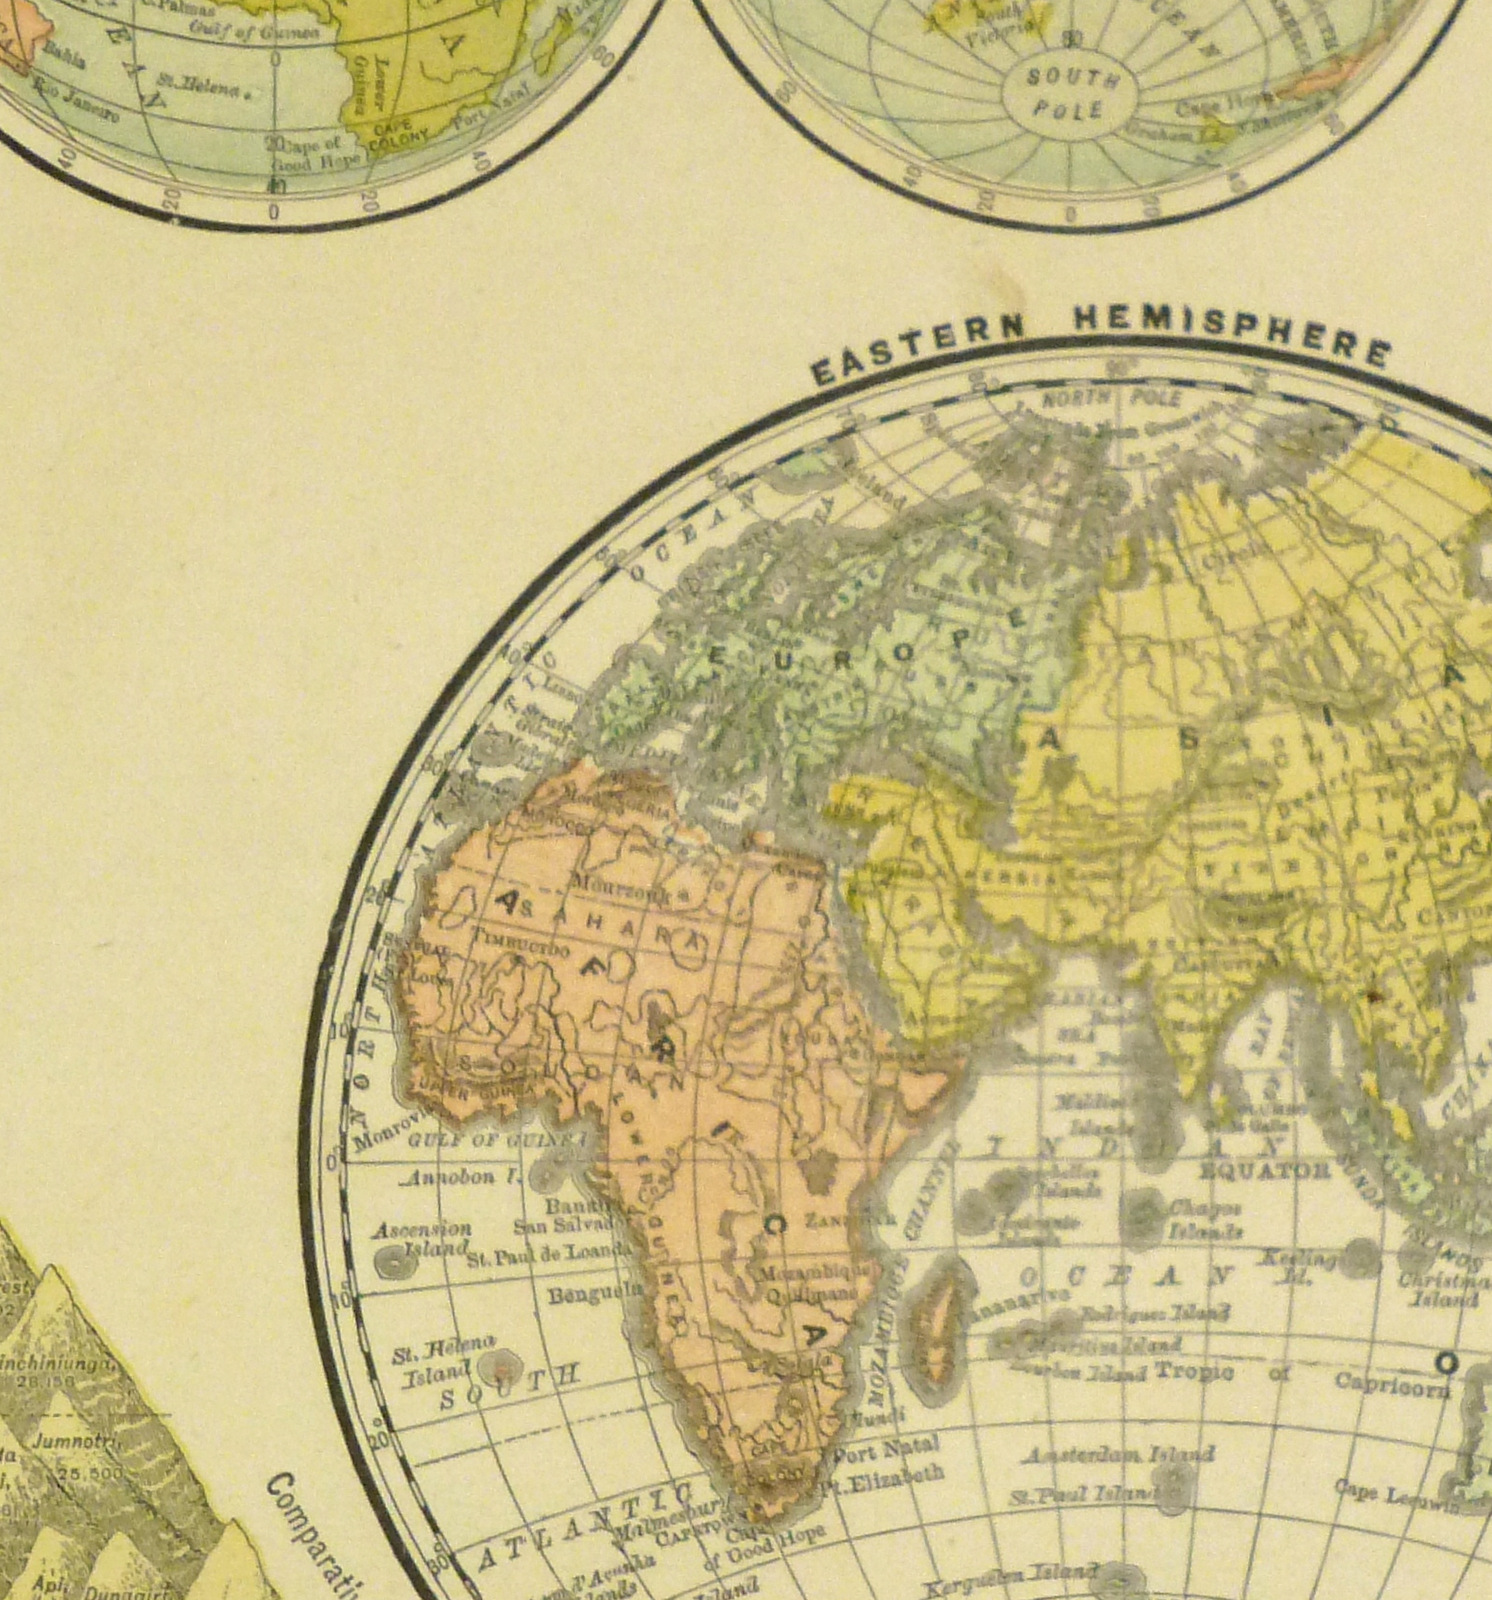 1890 World Map.World Hemisphere Map 1890 Original Art Antique Maps Prints